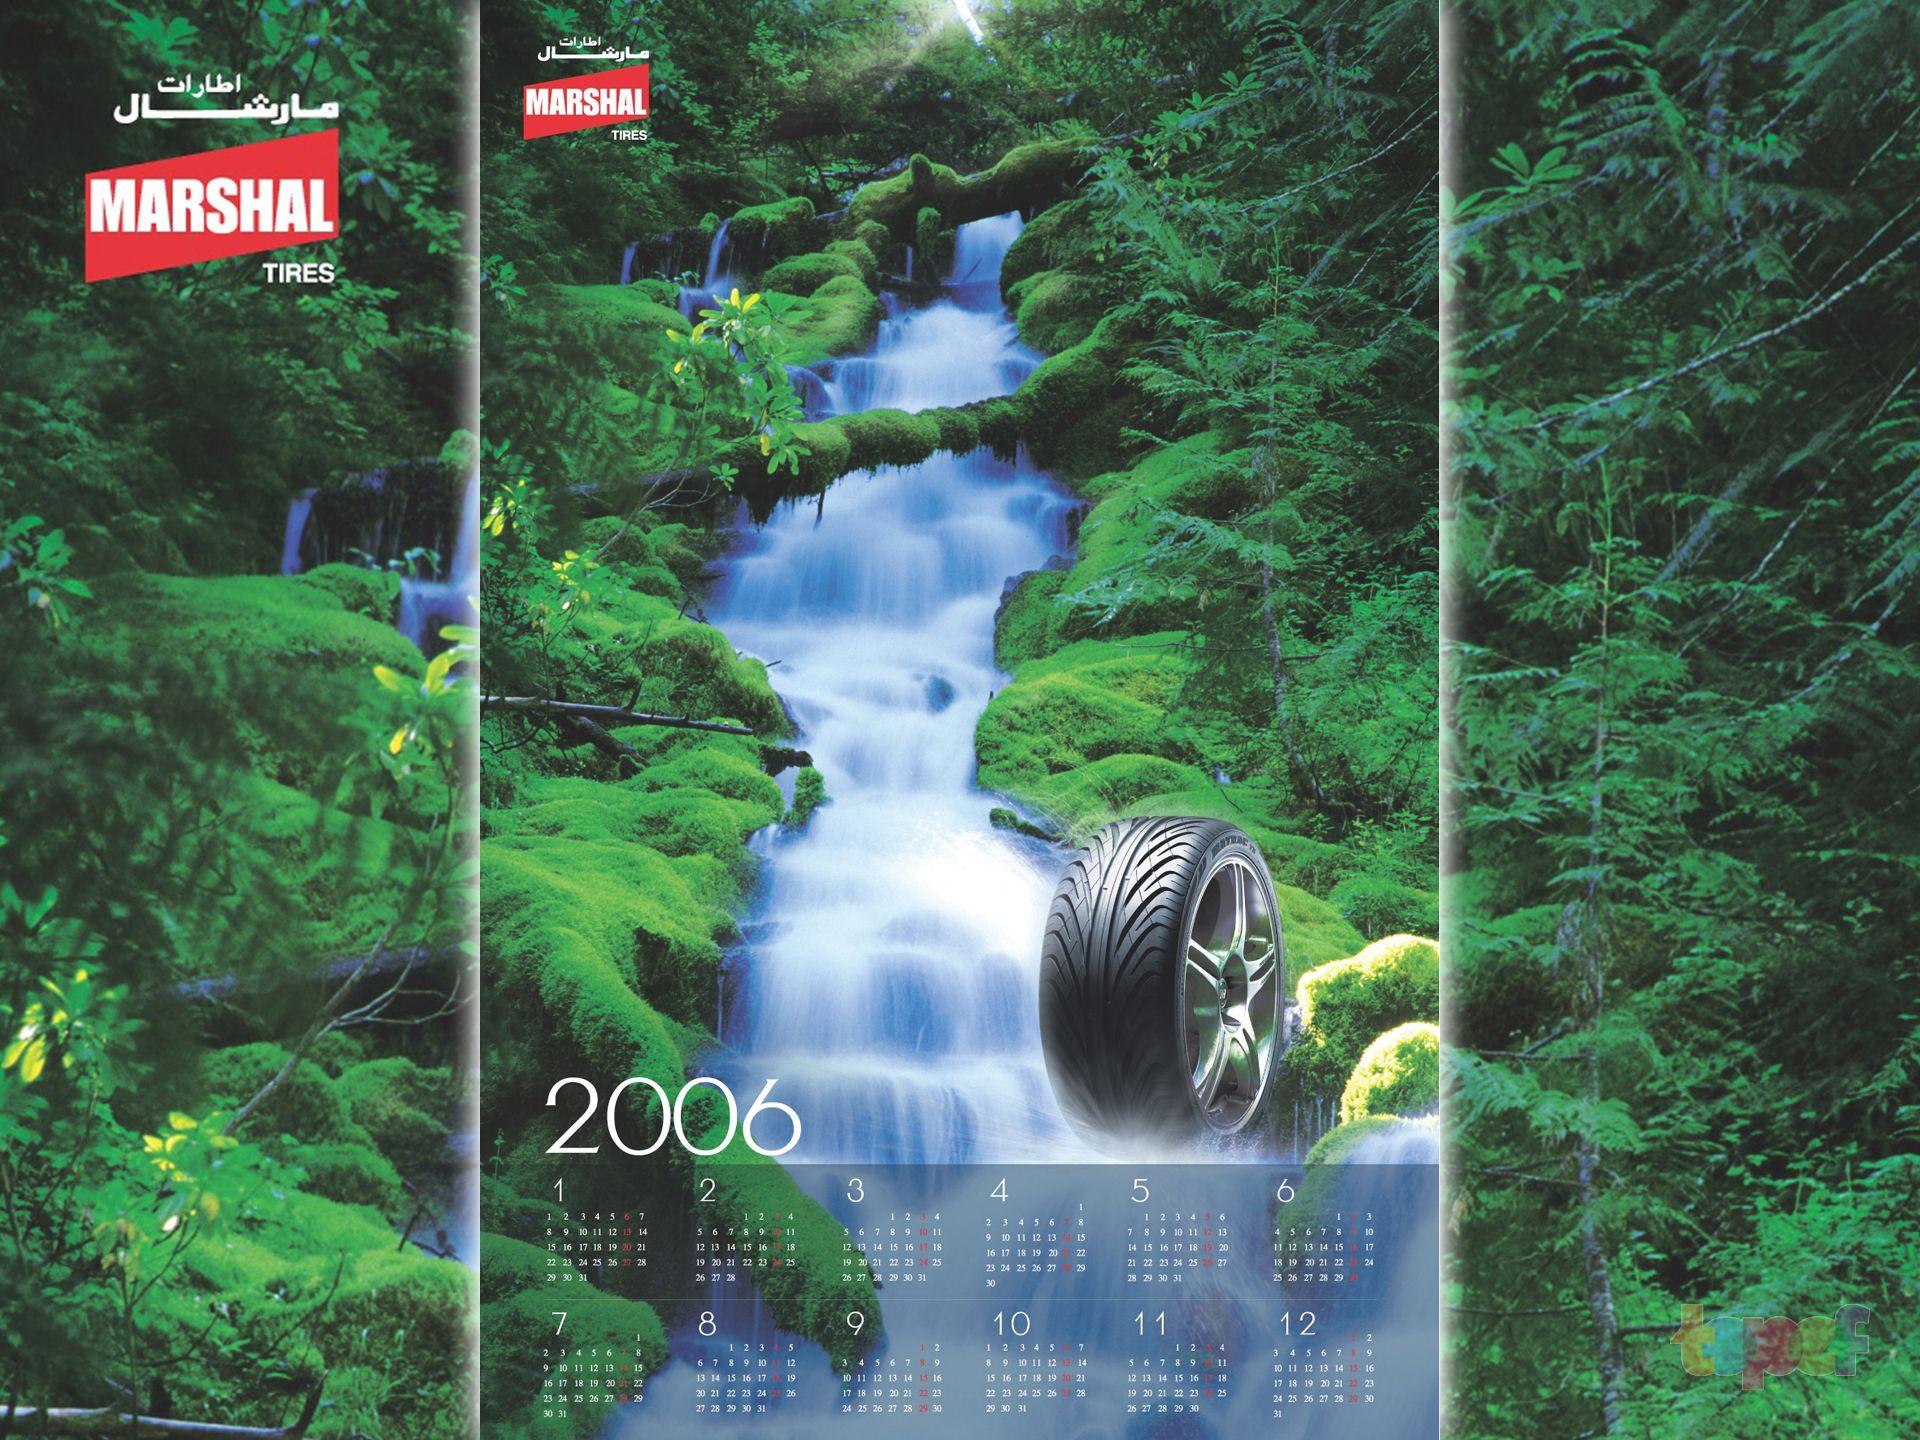 Календари от Marshal (Шины). 2006 год